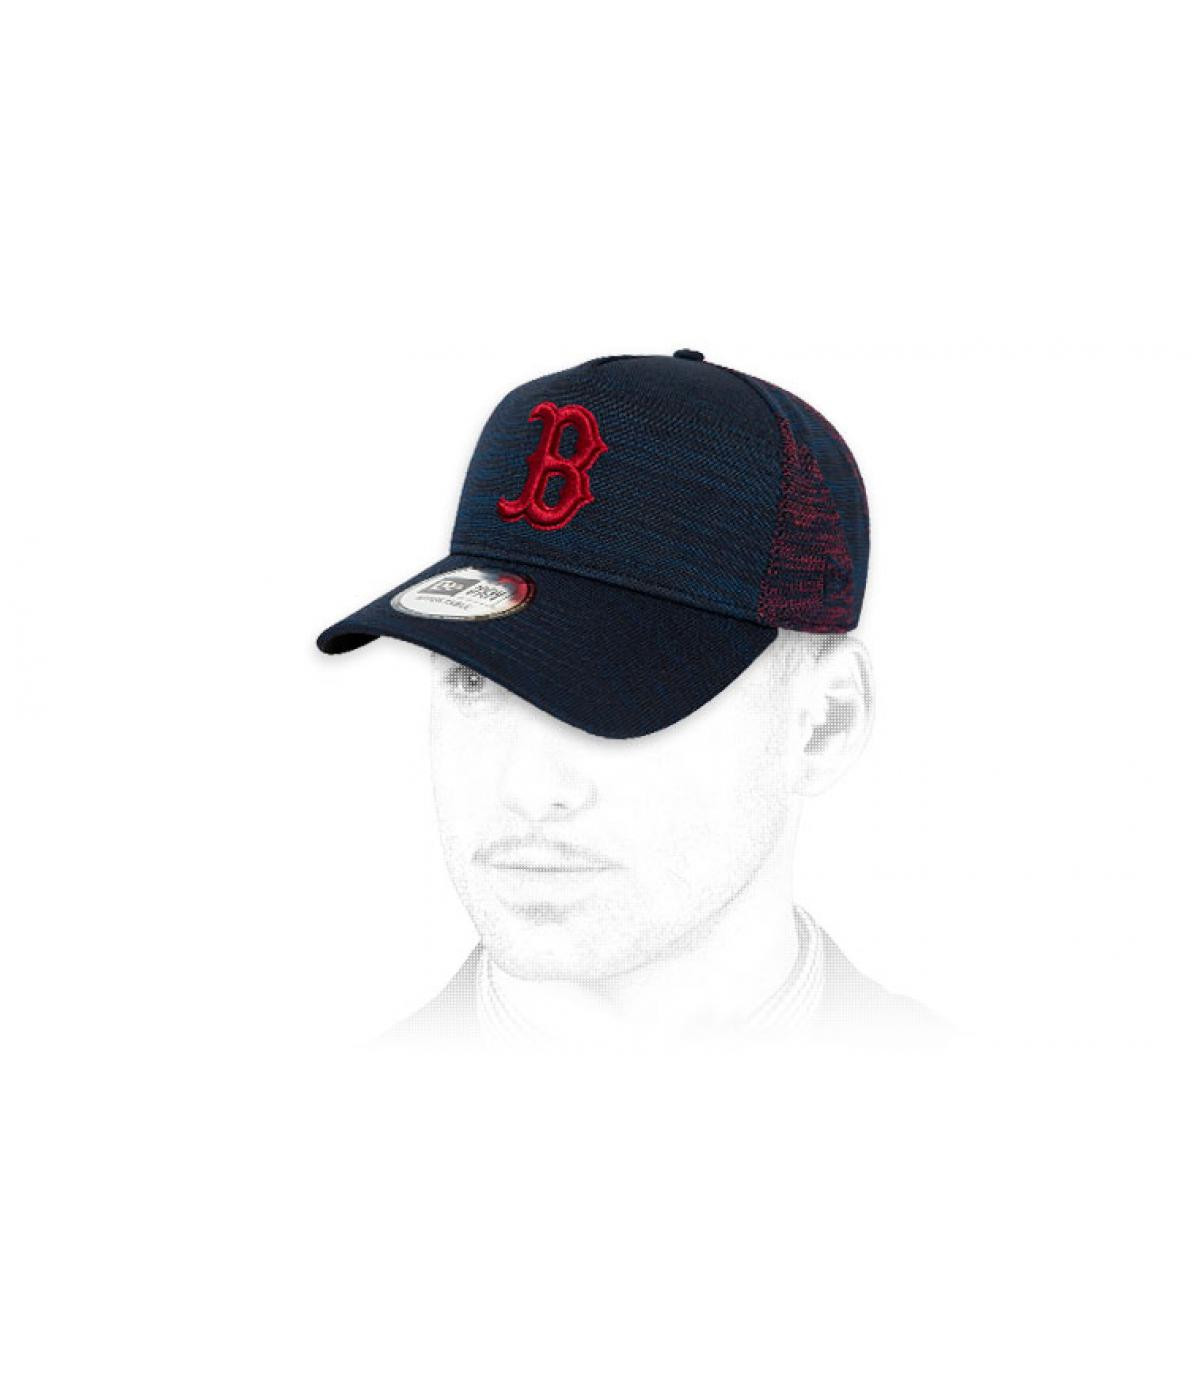 casquette B bleu rouge